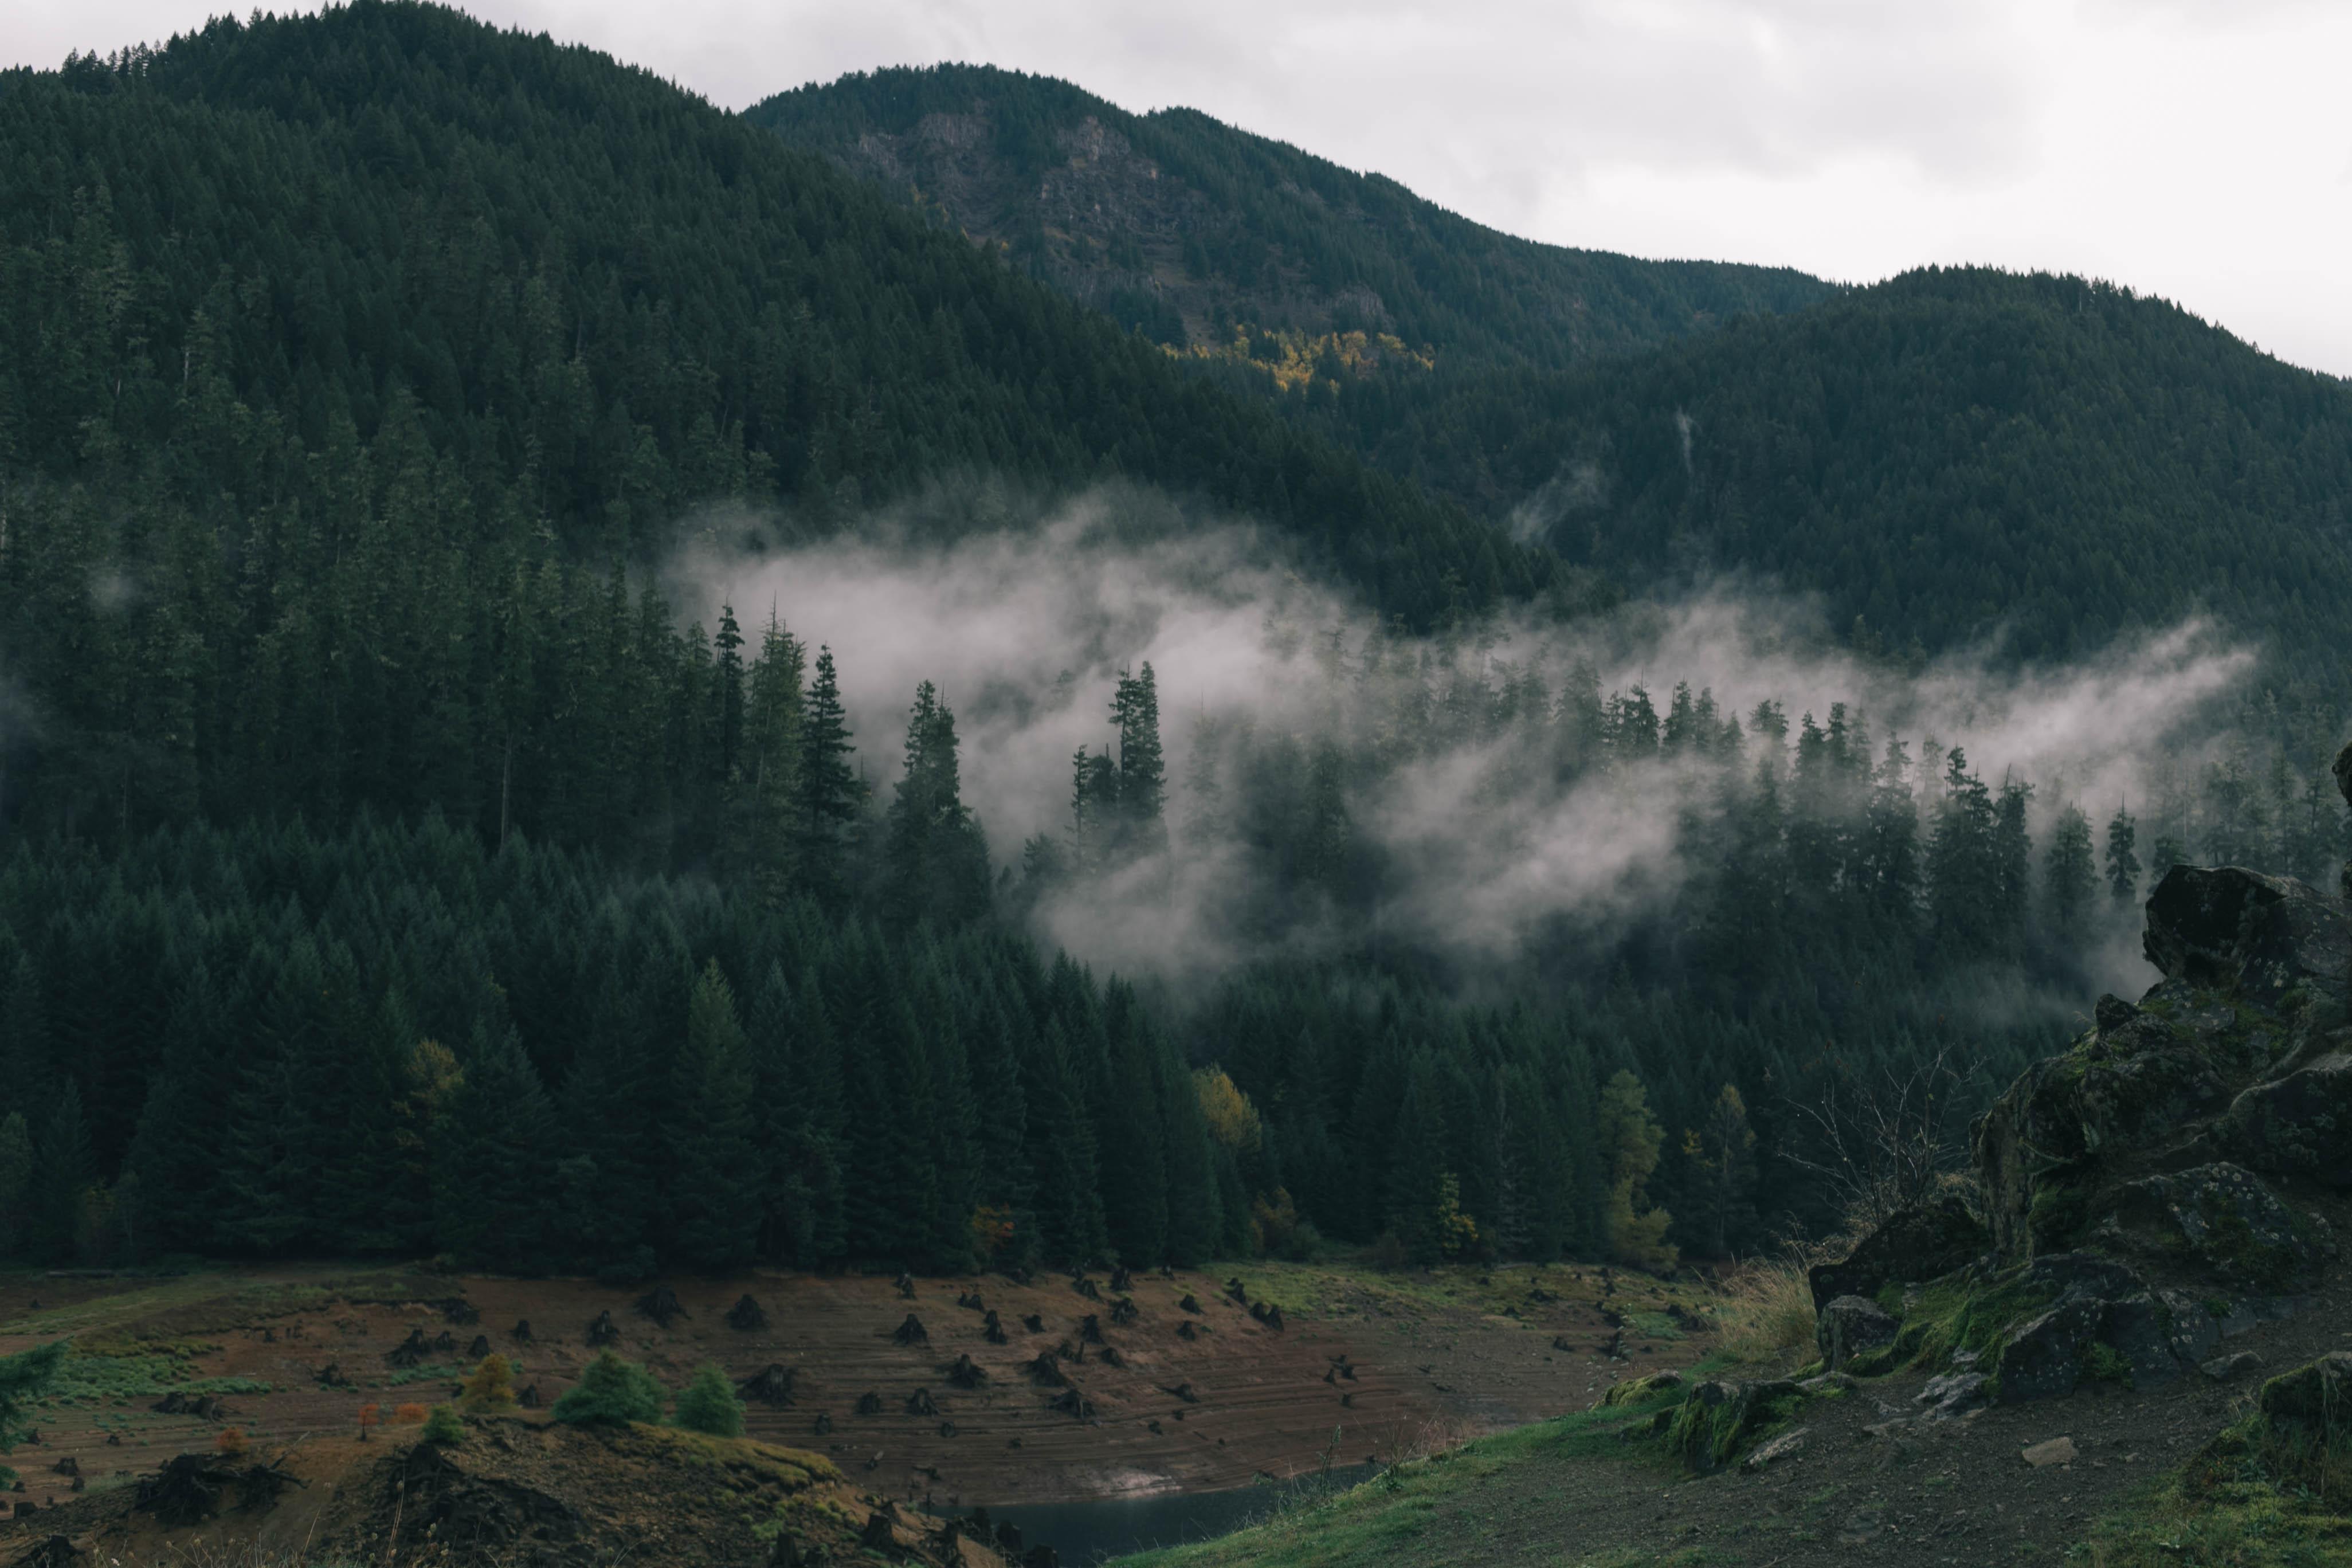 Hazy forest landscape photo